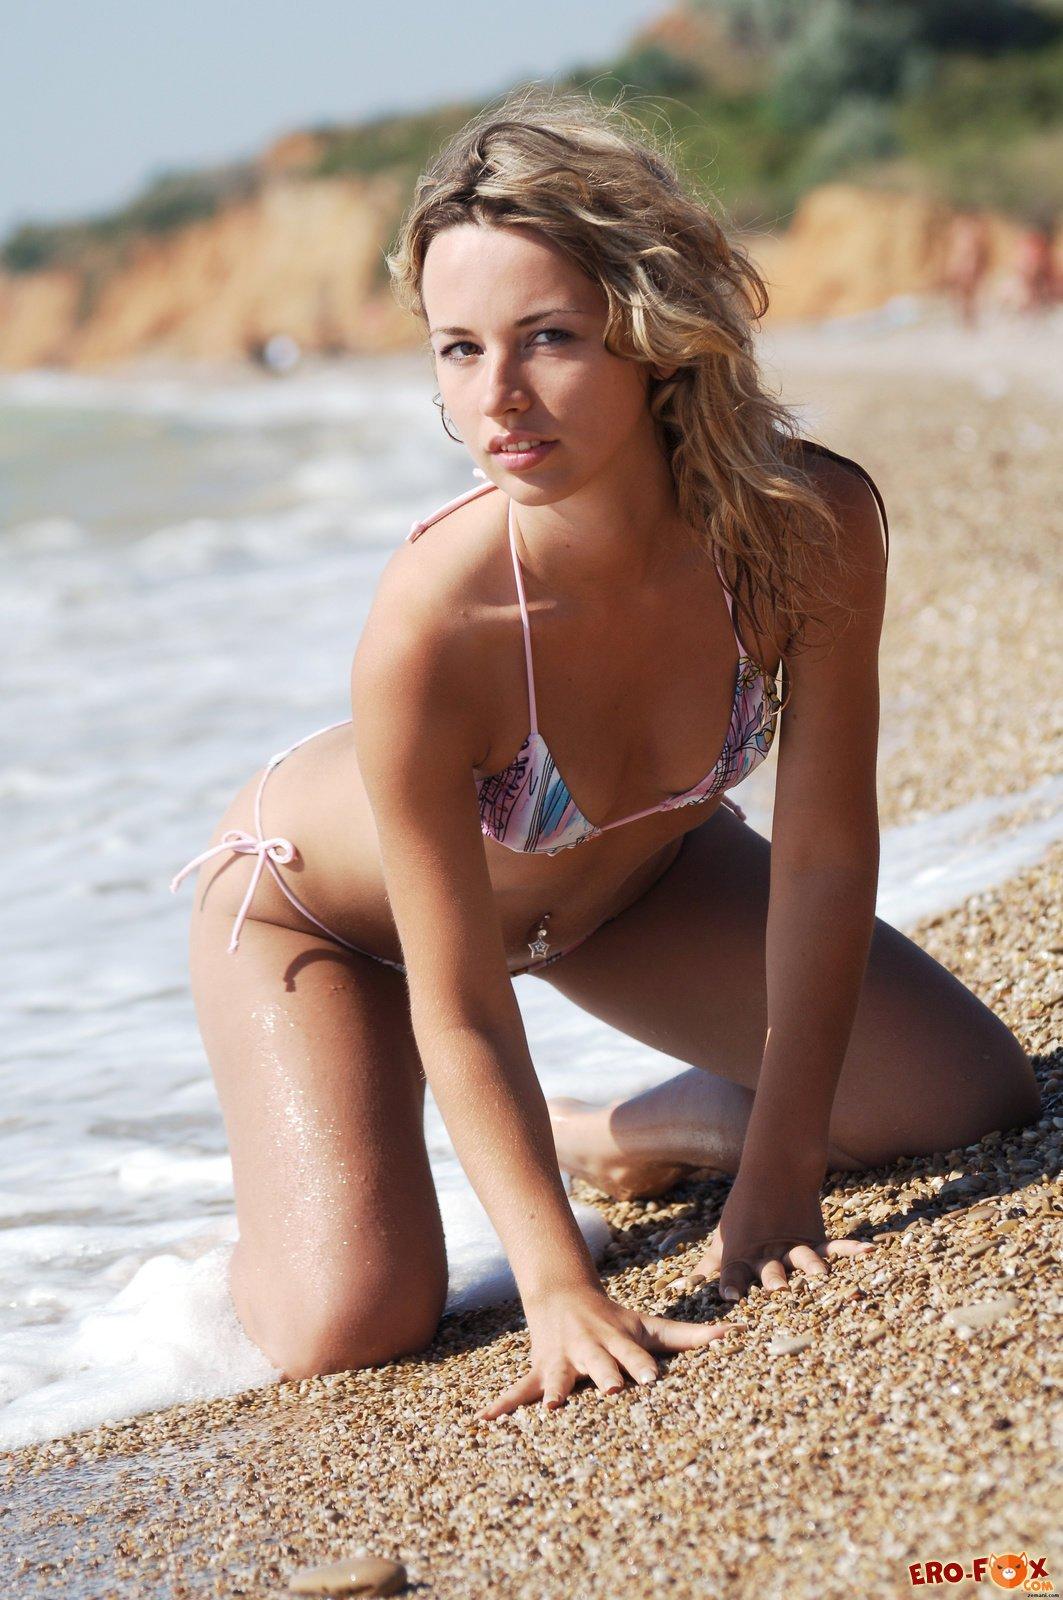 Девушка разделась на пляже при людях